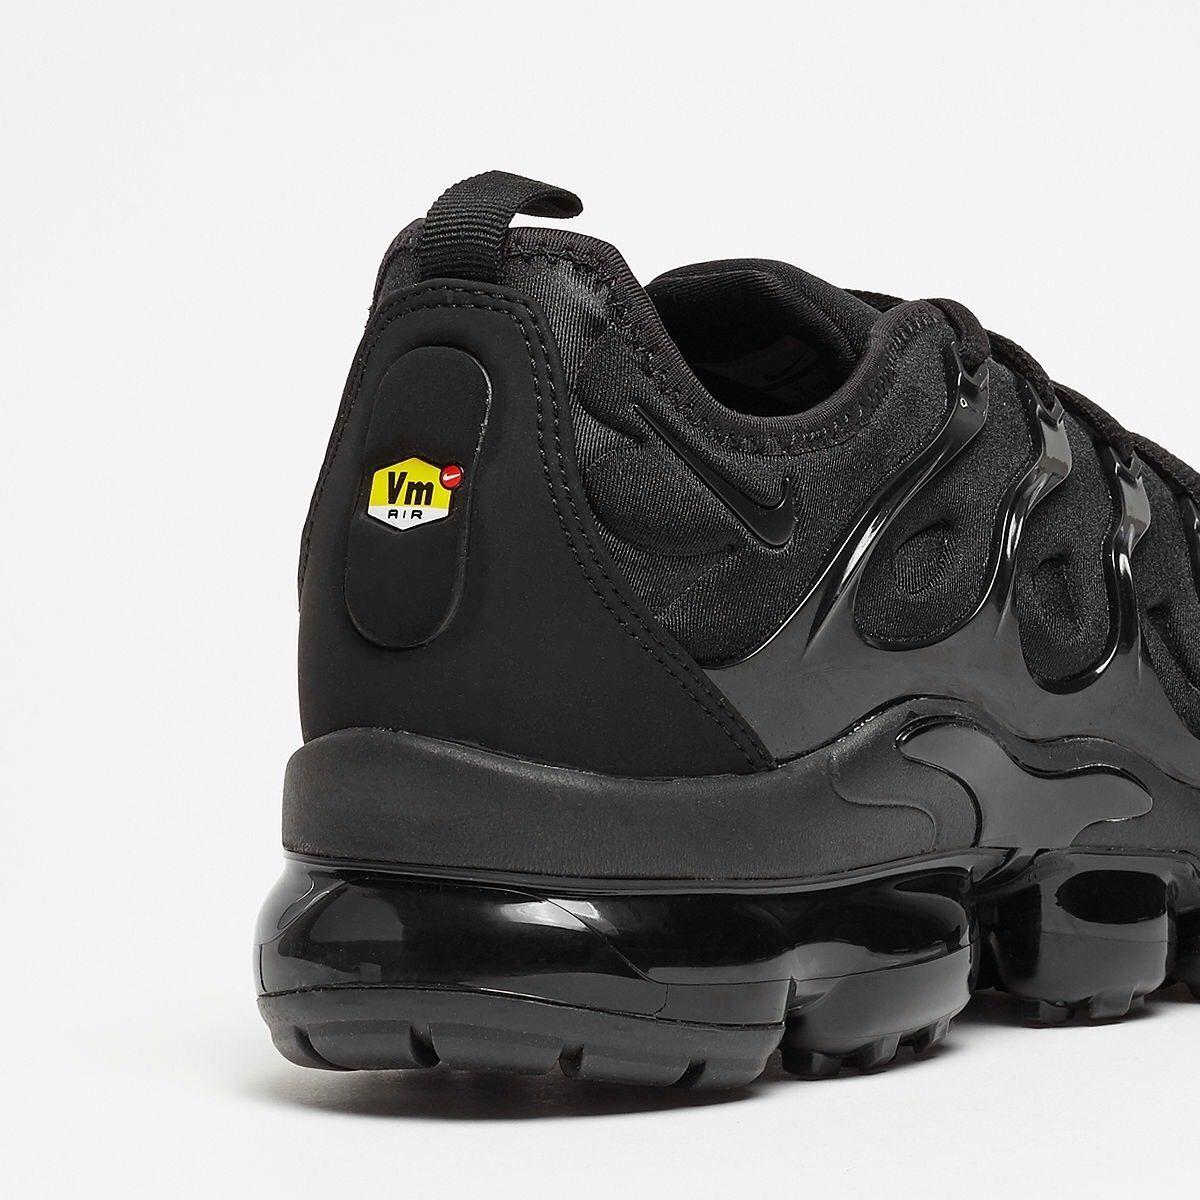 Nike Air VaporMax Plus All Black 924453